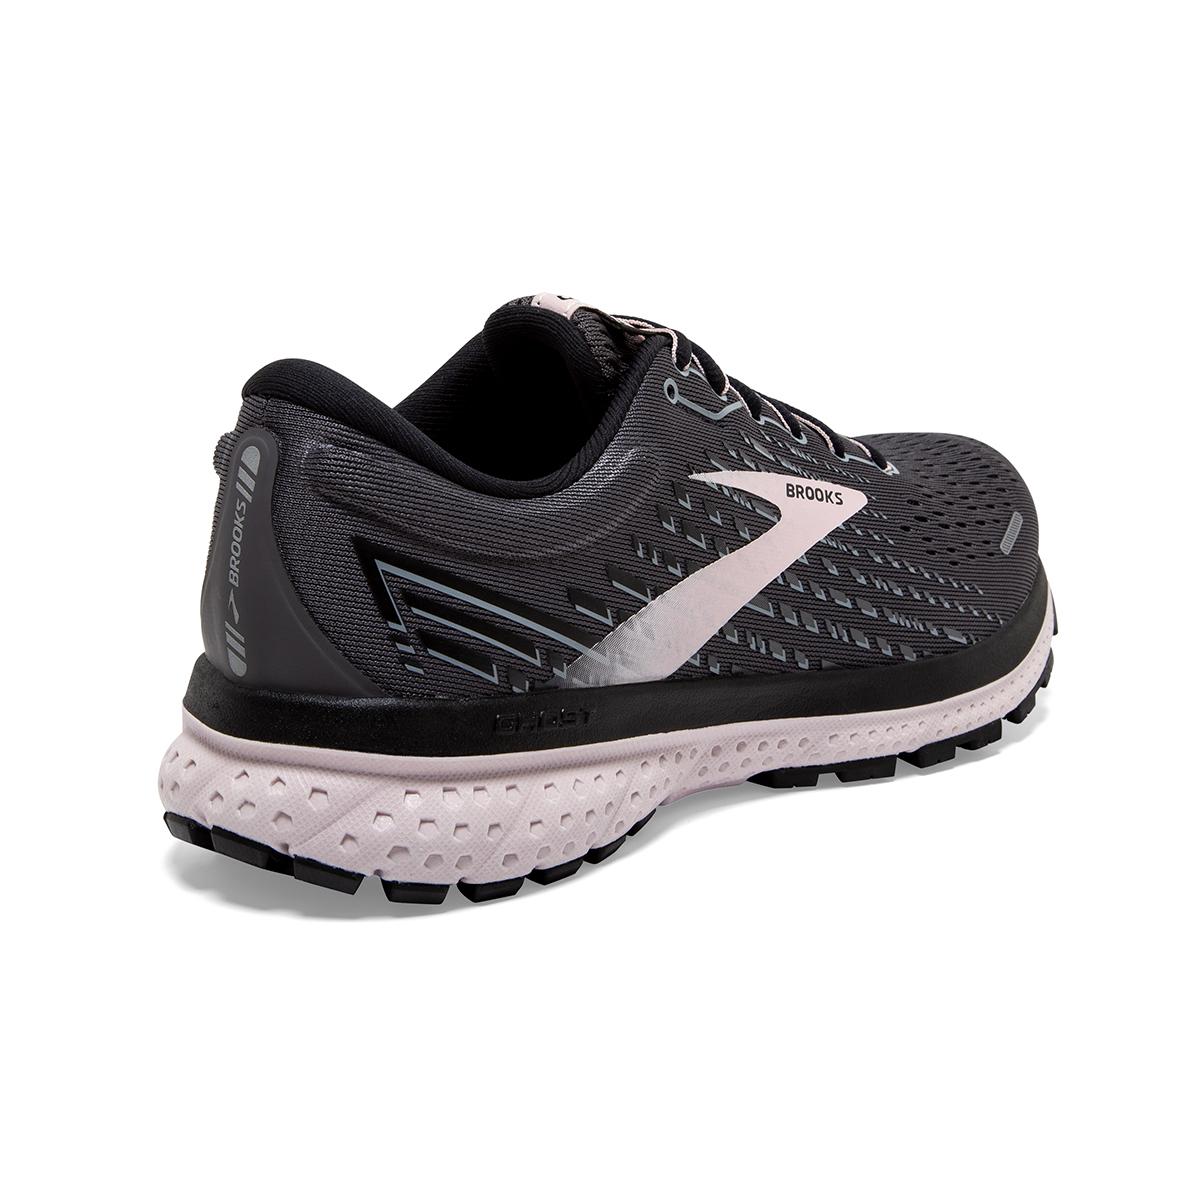 Women's Brooks Ghost 13 Running Shoe, , large, image 6